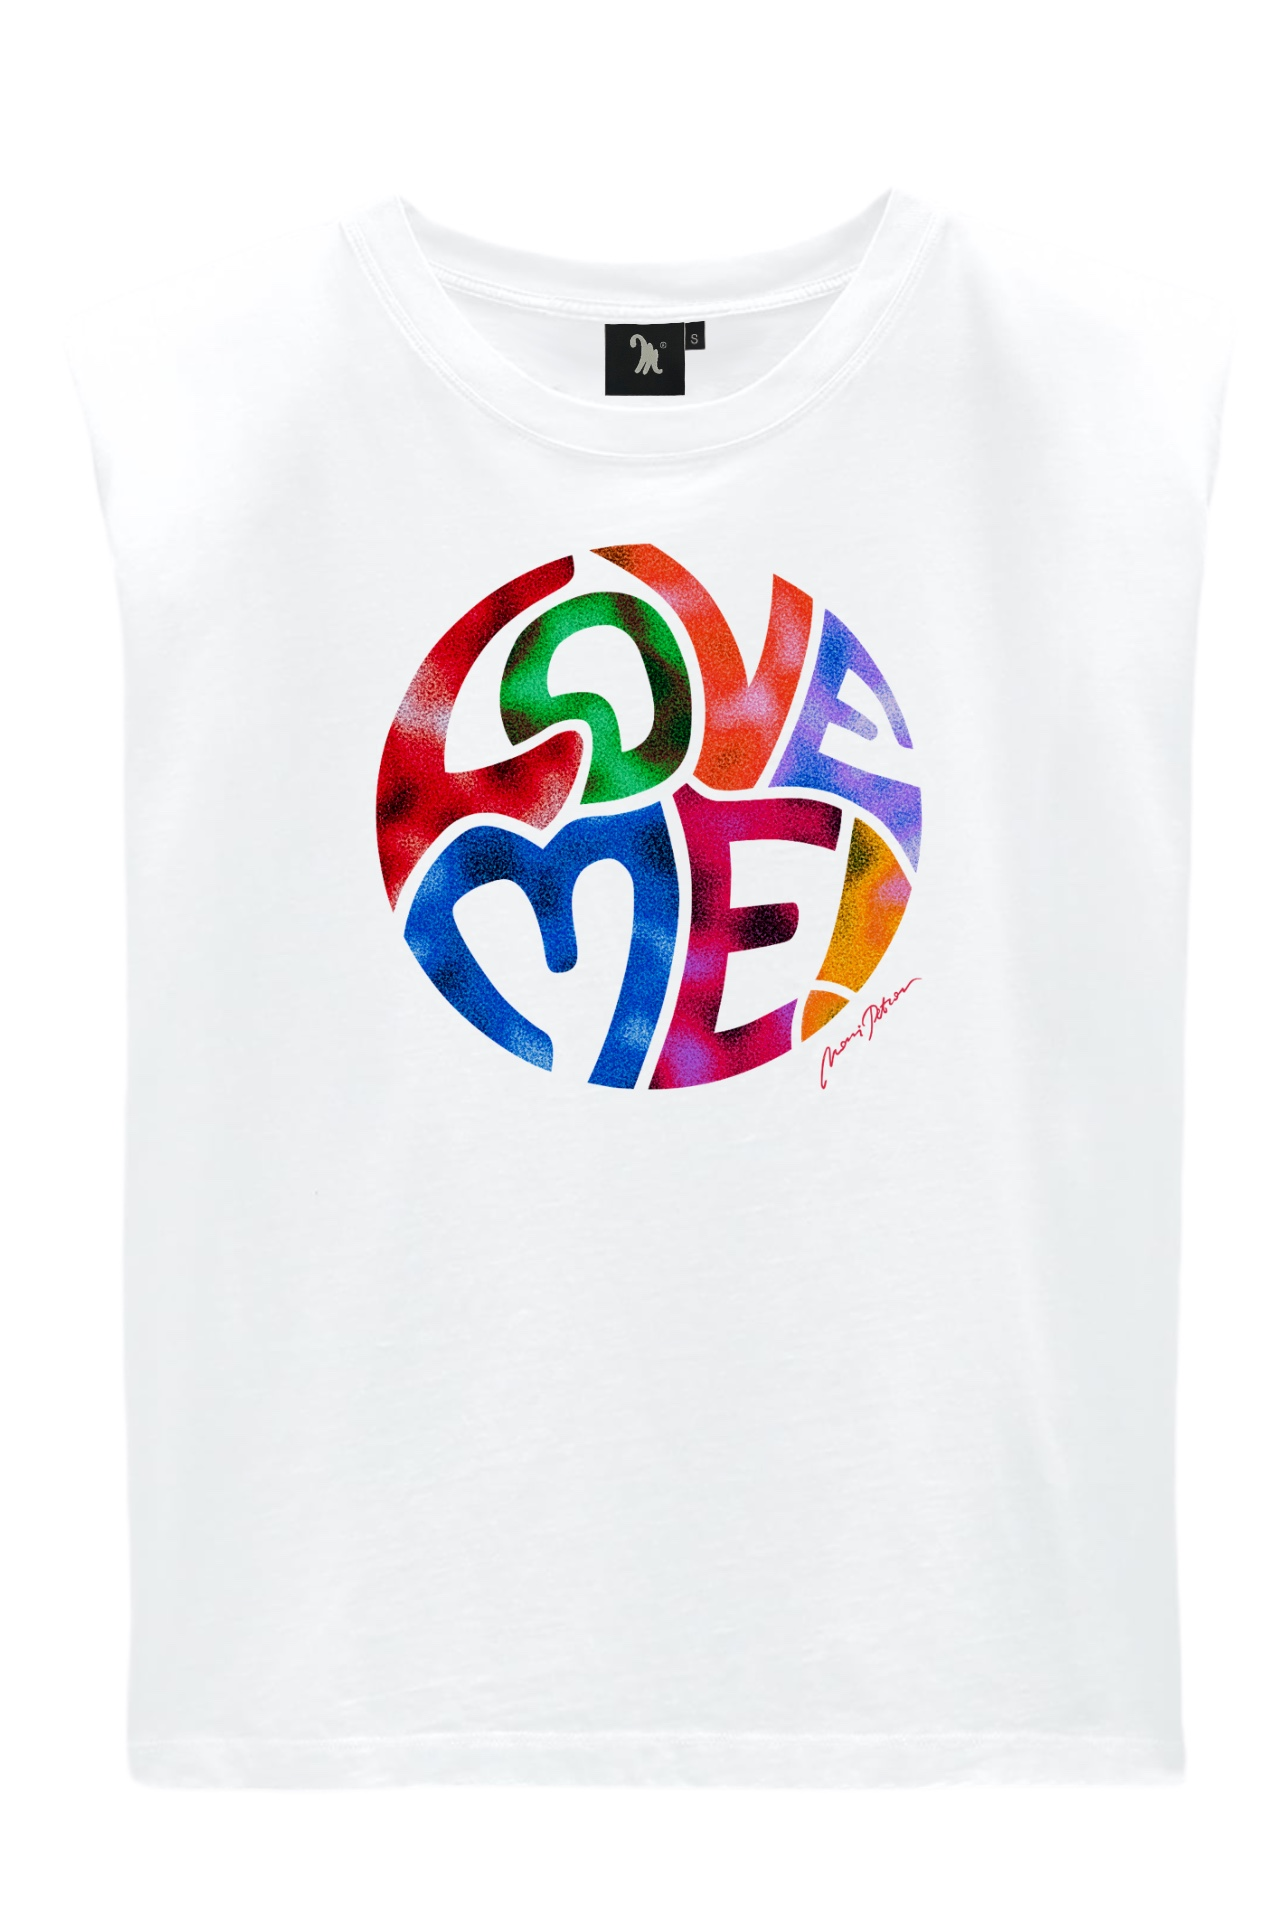 TOP ROKA WHITE LOVE 32 2